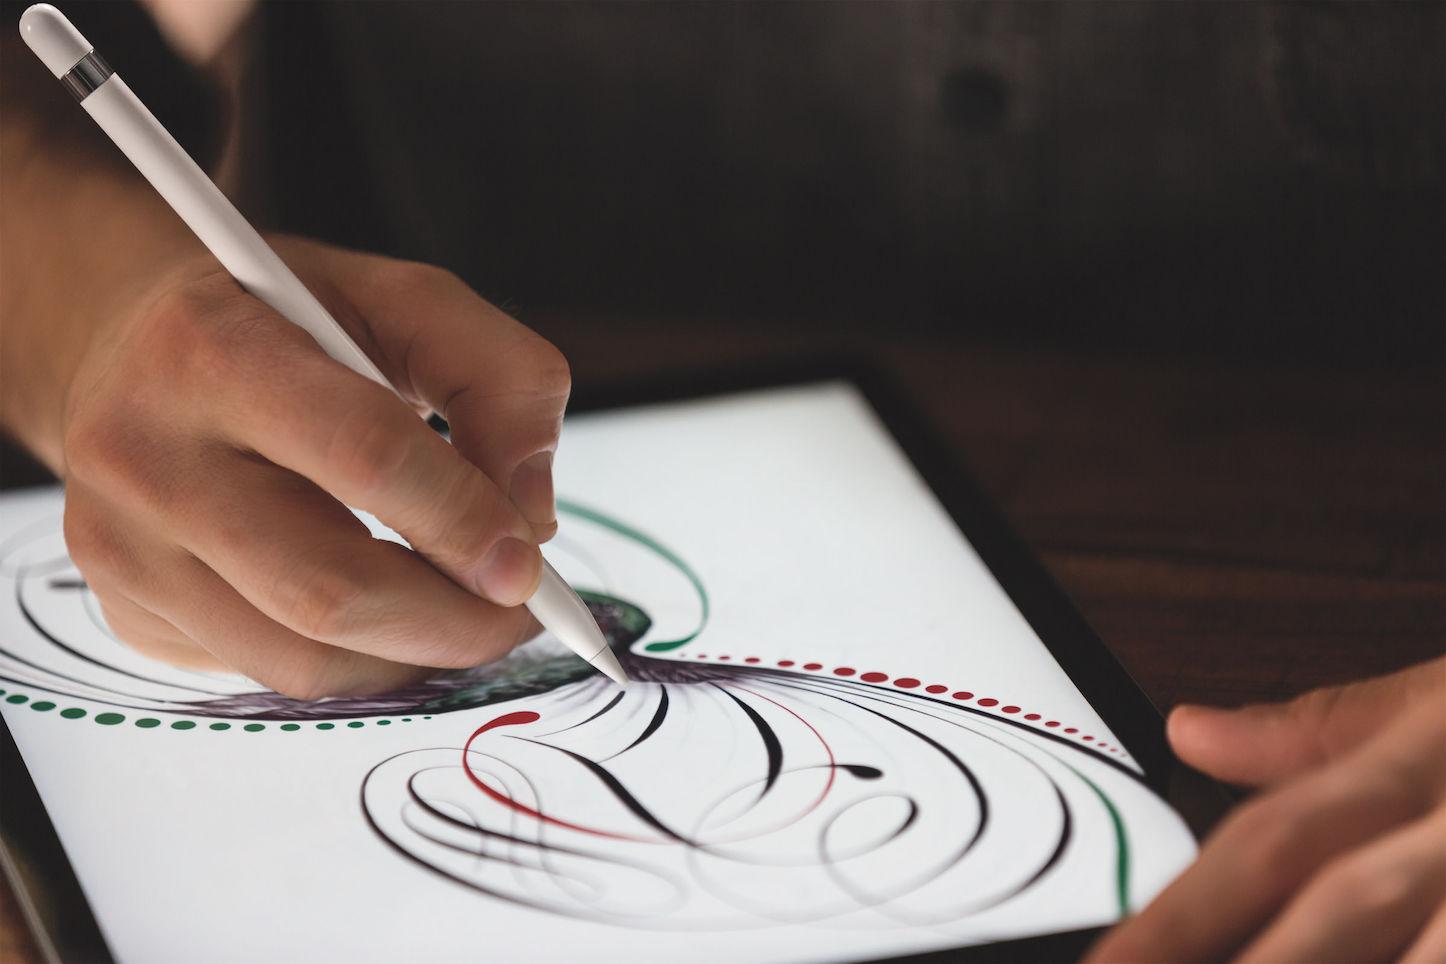 IPadPro Pencil Lifestyle2